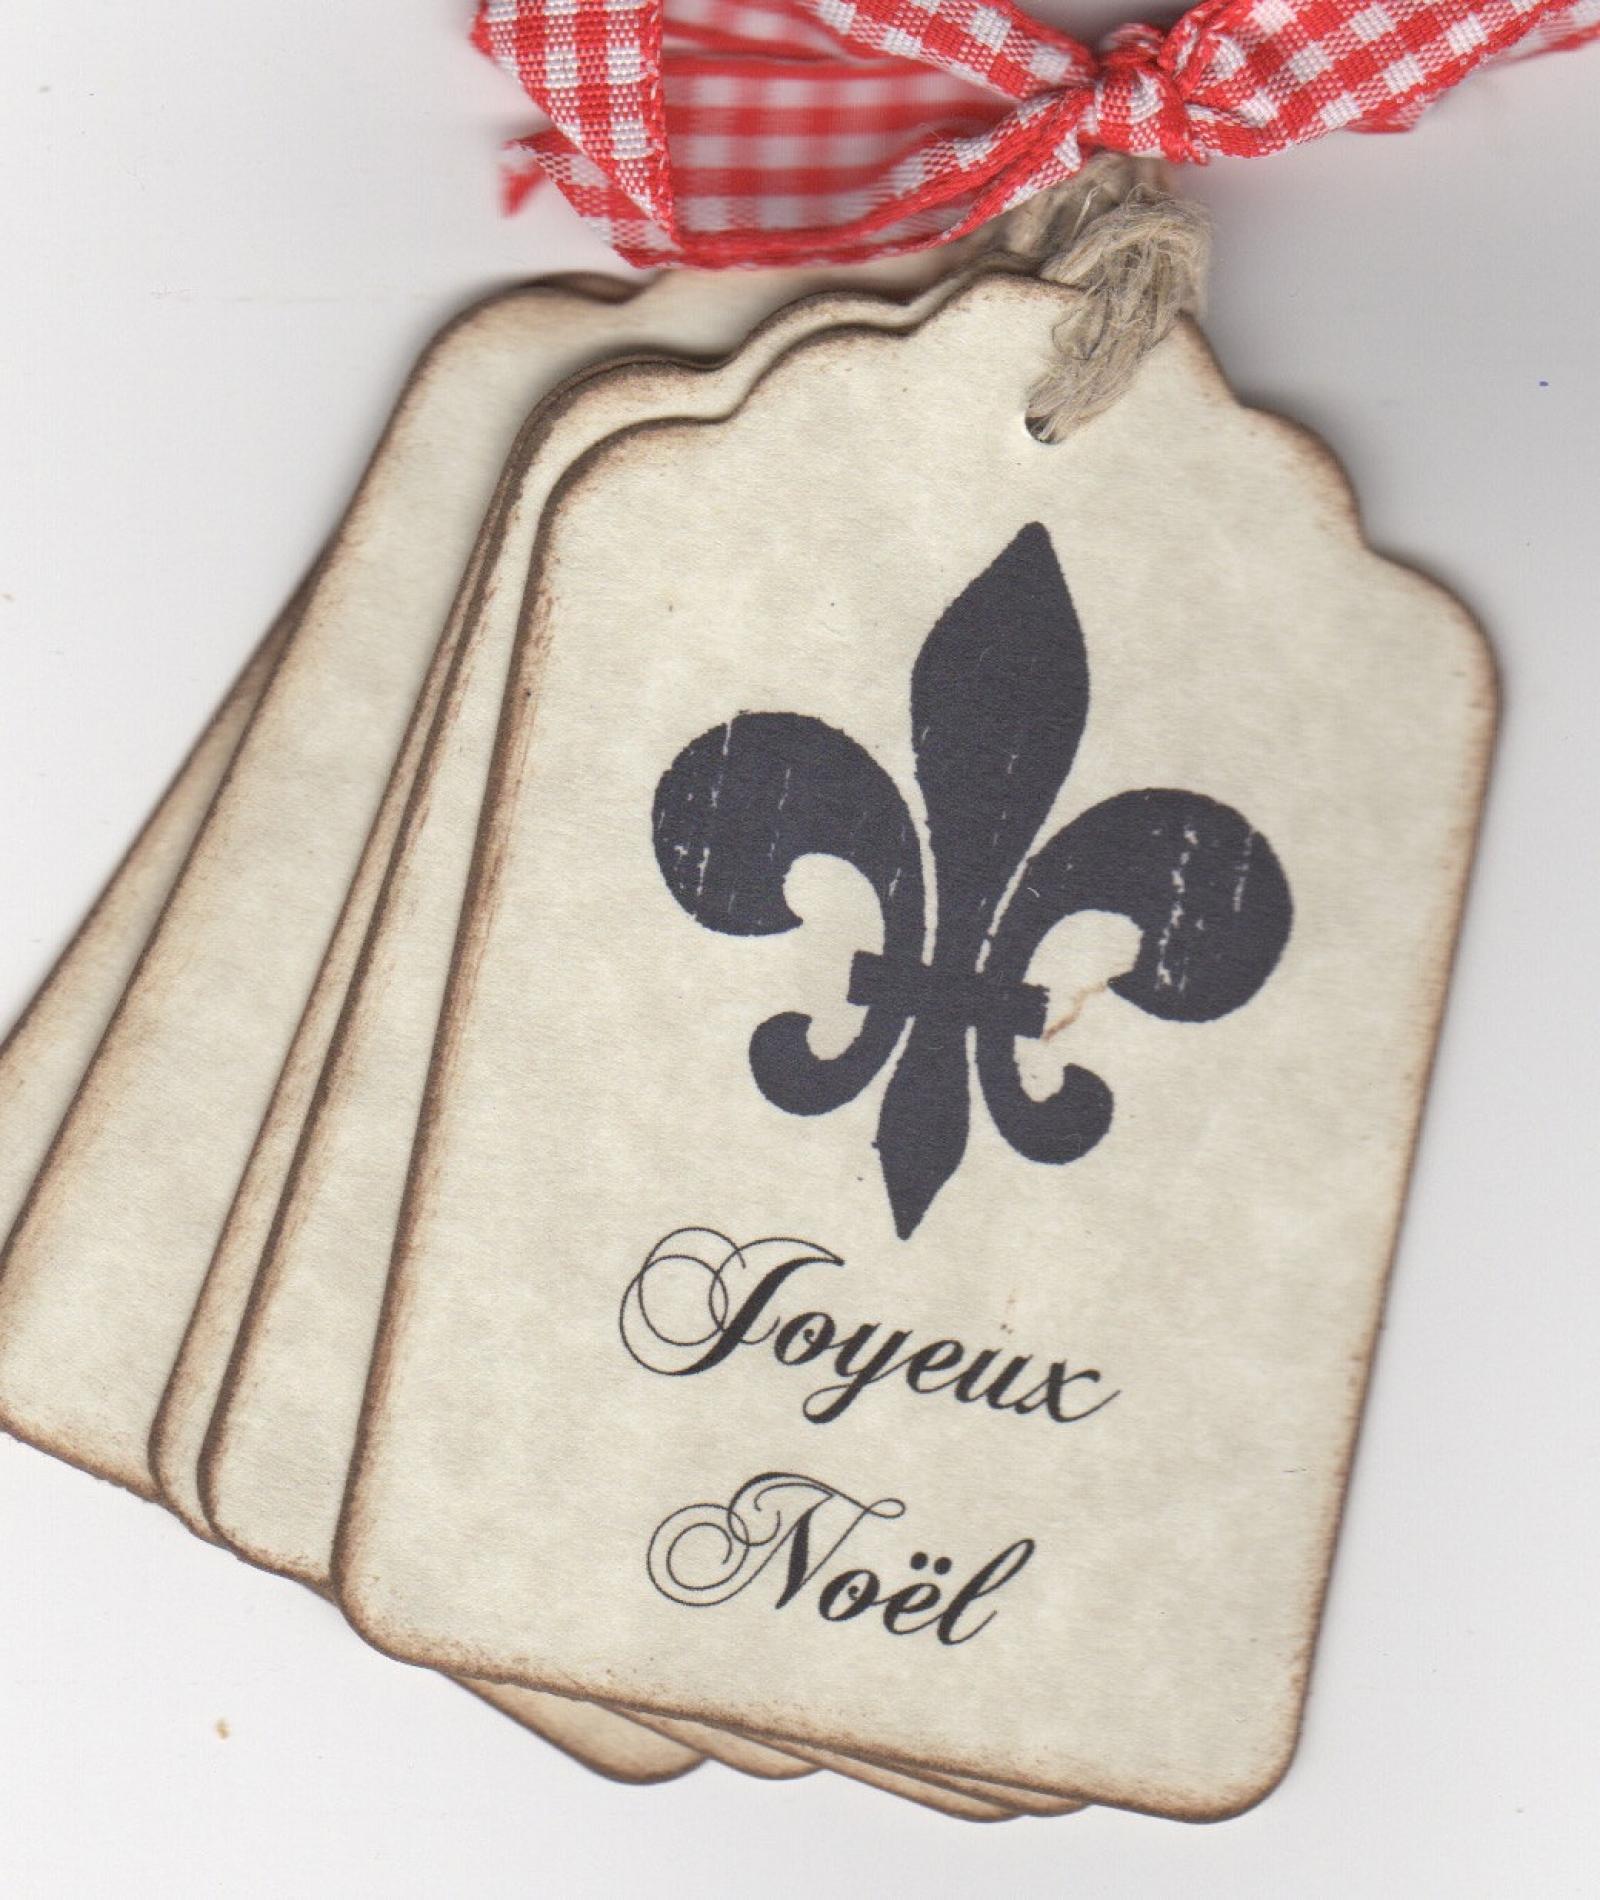 Vintage Inspired Christmas Gift Tags French Fleur De Lis Joyeux Noël ...